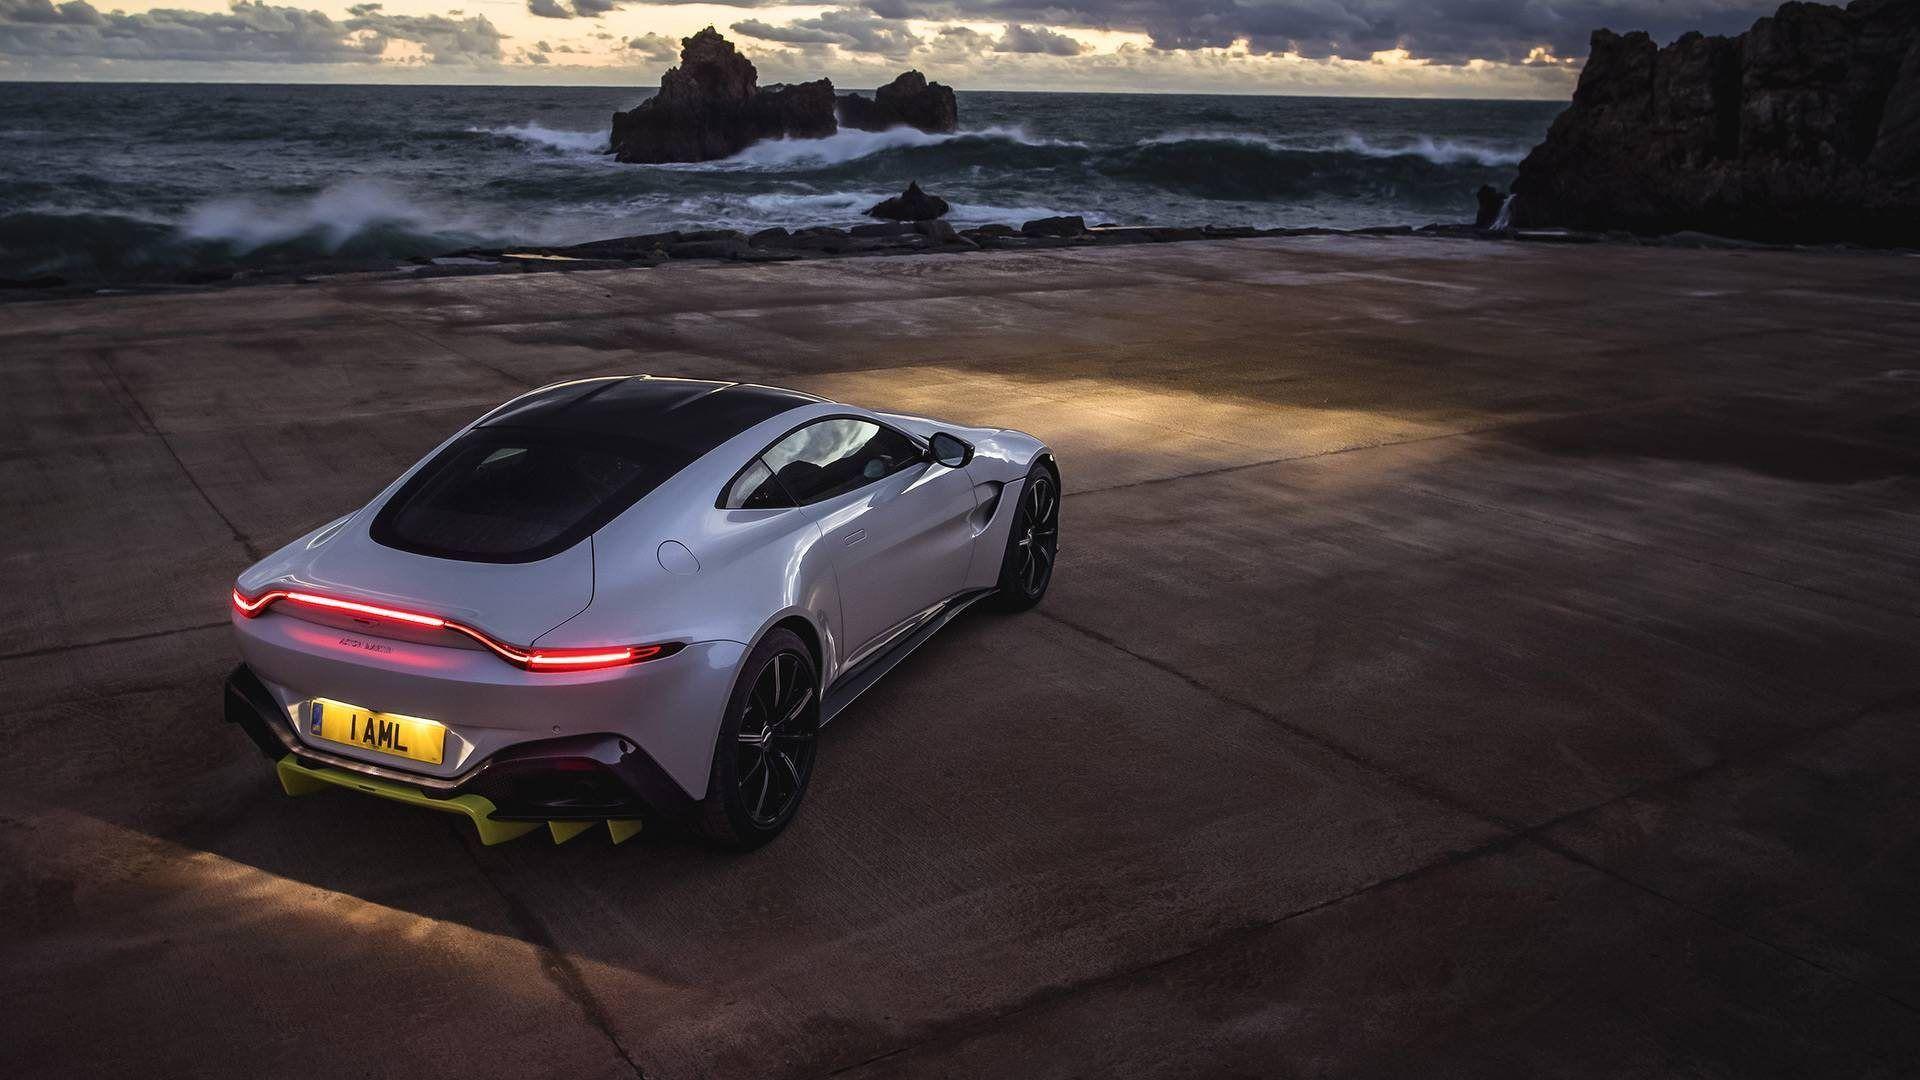 2021 Aston Martin Vanquish New Concept Aston Martin Vanquish Aston Martin Aston Martin Vulcan